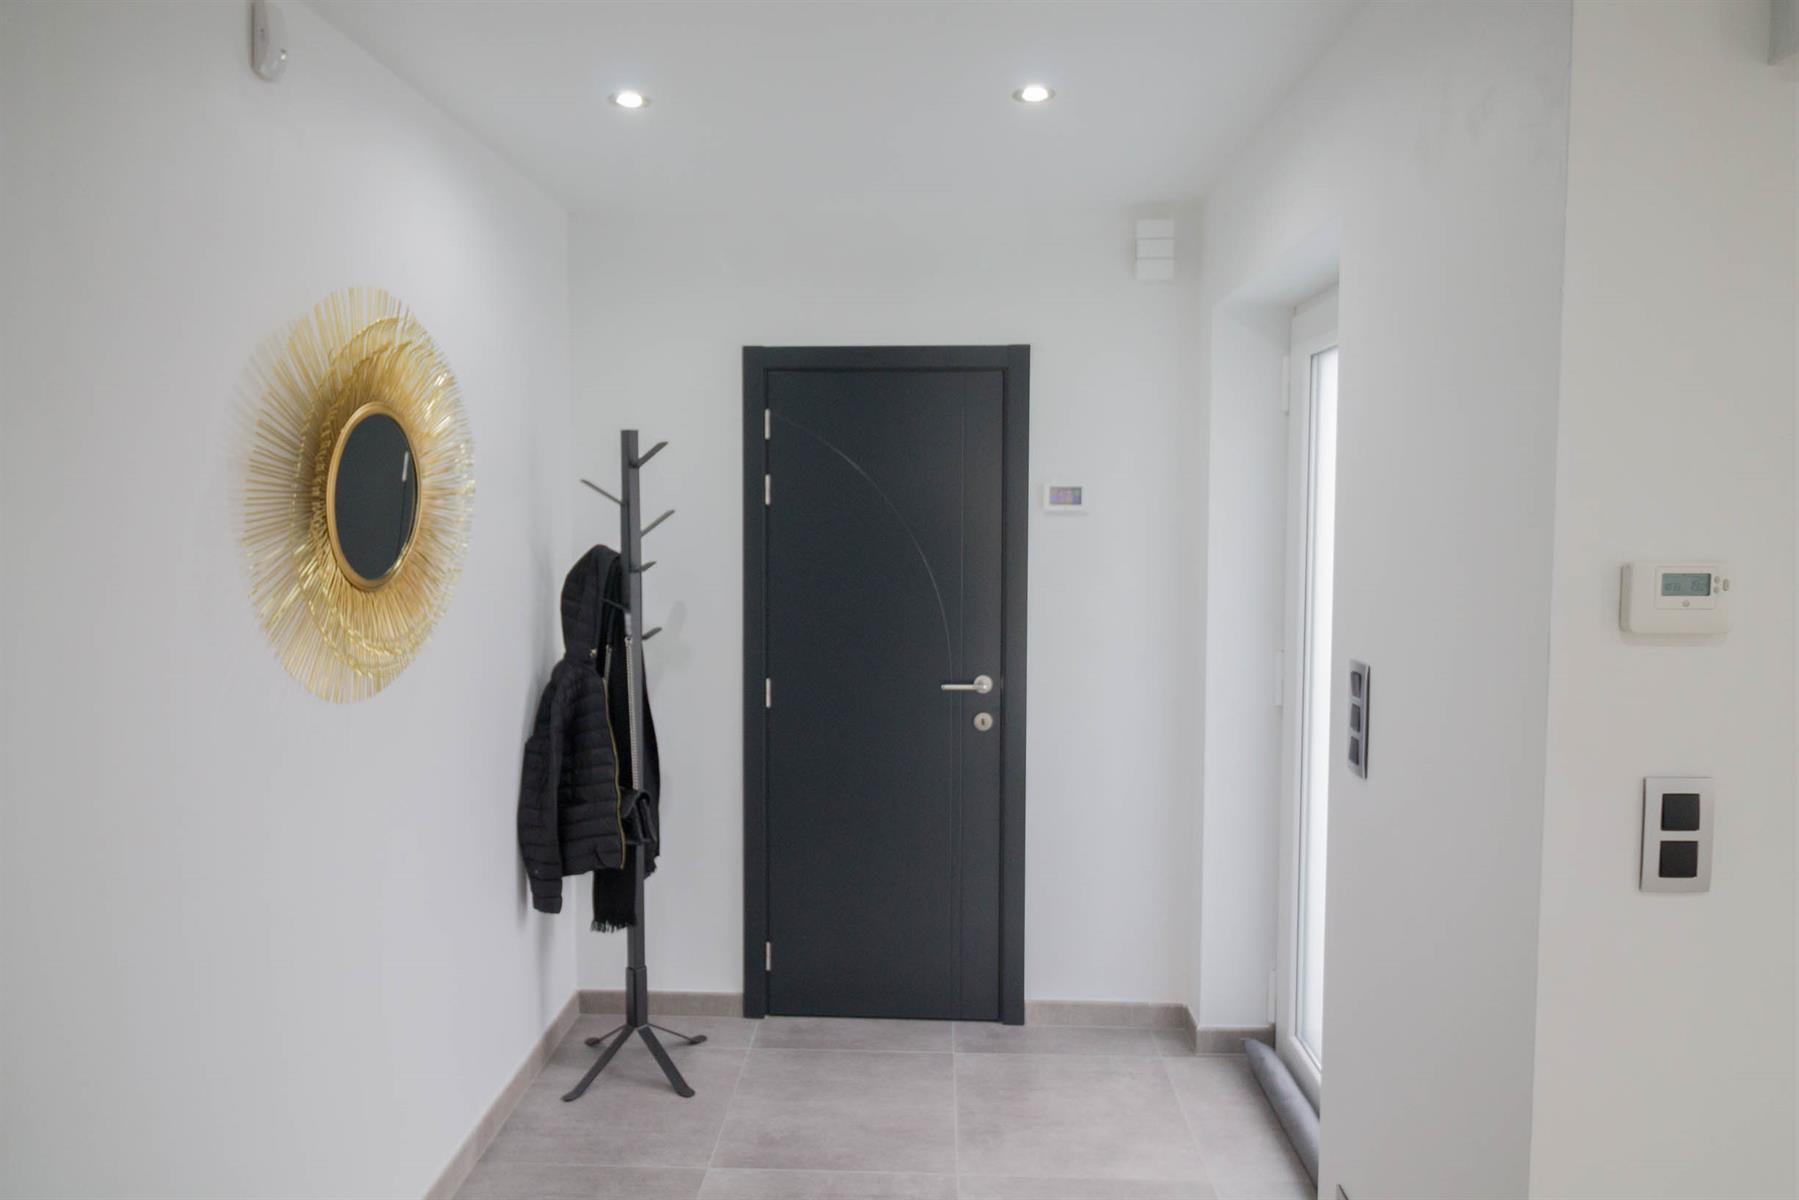 Maison - Maurage - #4321123-1